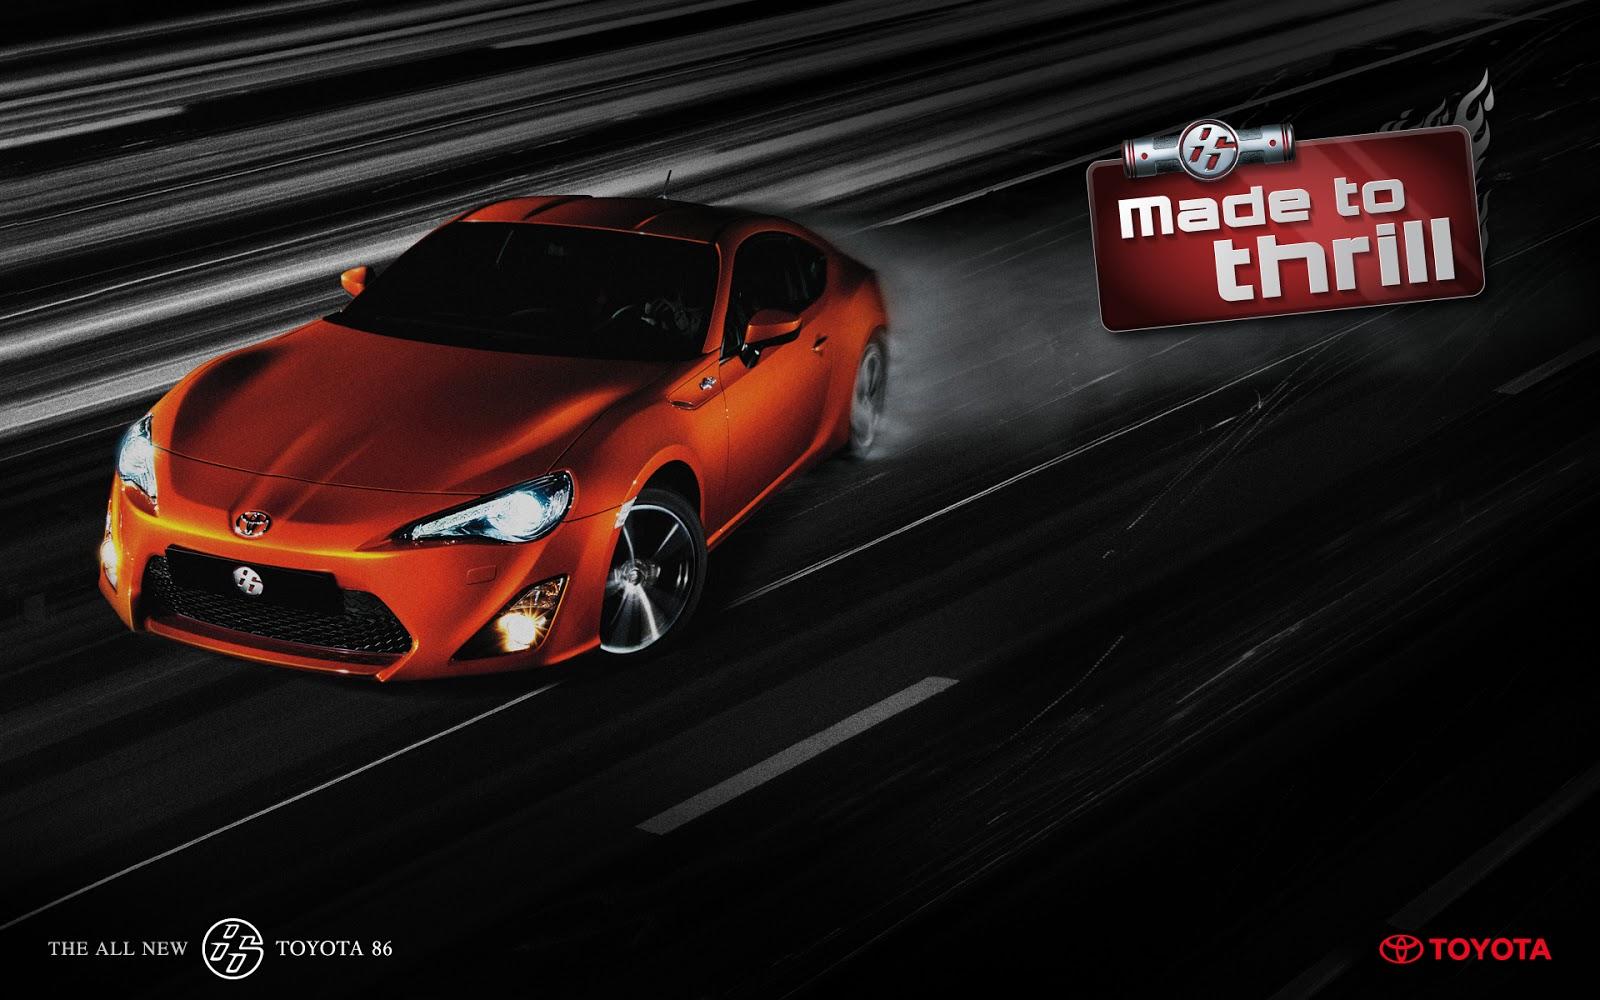 http://3.bp.blogspot.com/-rISWXL9nfOc/UIfjXmWKmjI/AAAAAAAAFcg/kRIQ8gxWEoE/s1600/Toyota-86-Subaru-BRZ-Scion+FR-S-sports+car-coupe-exterior-view-RED-front-side-3.jpg